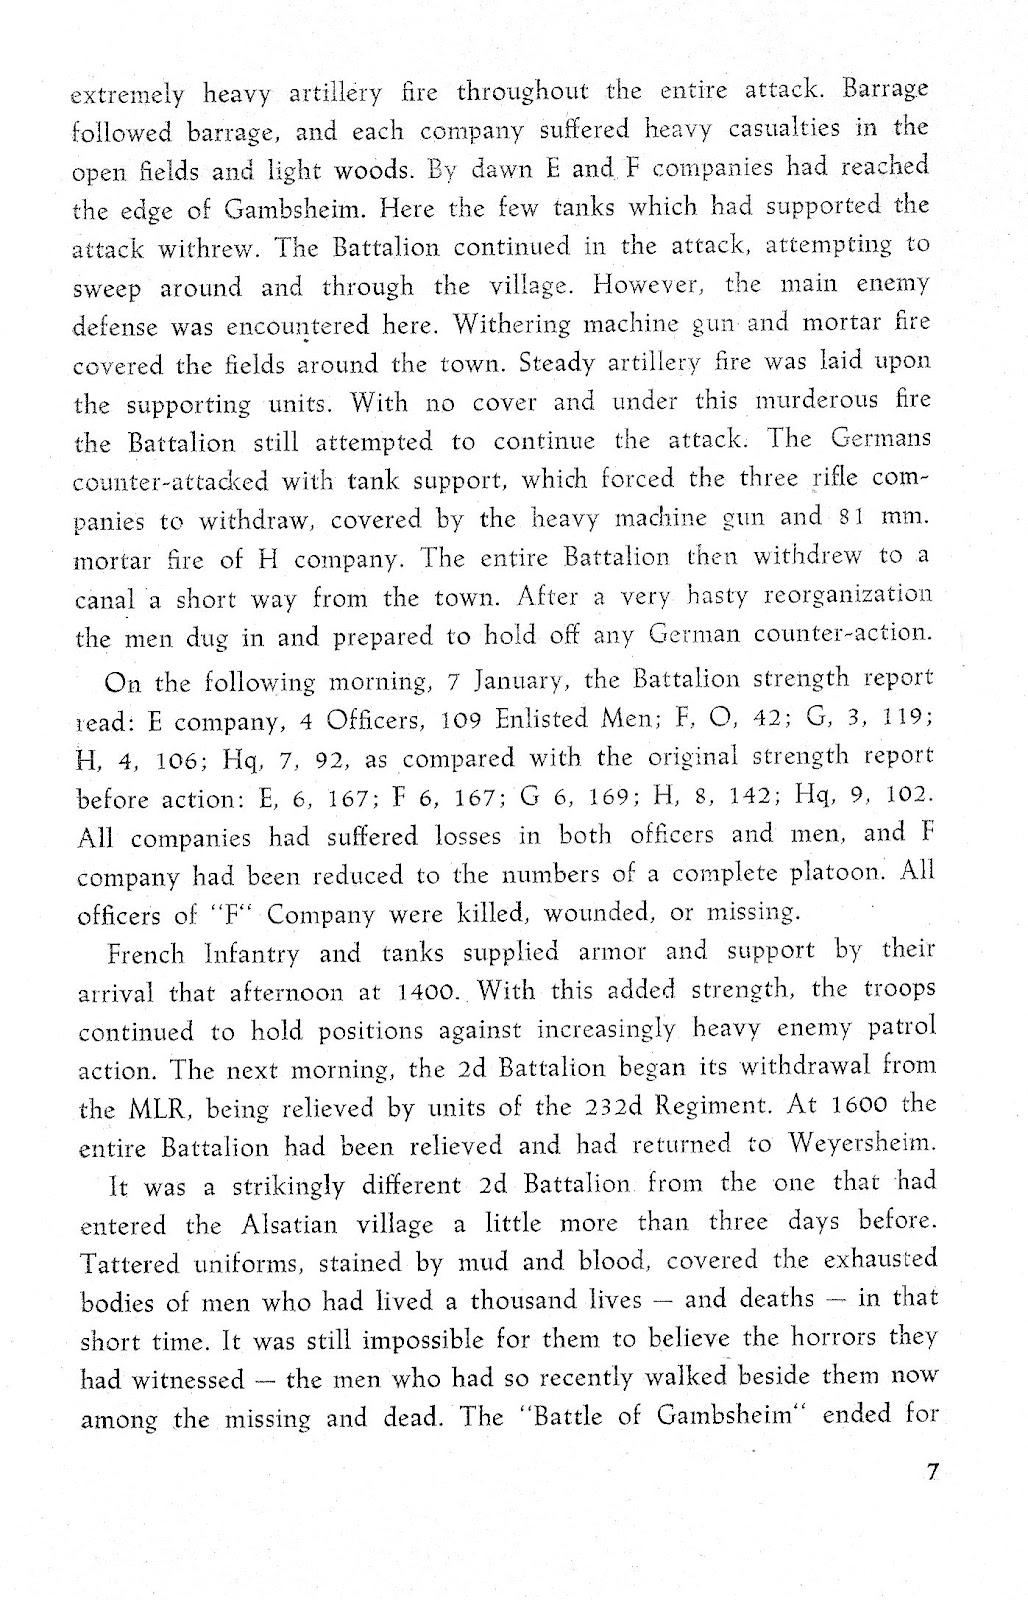 History pg7.jpg